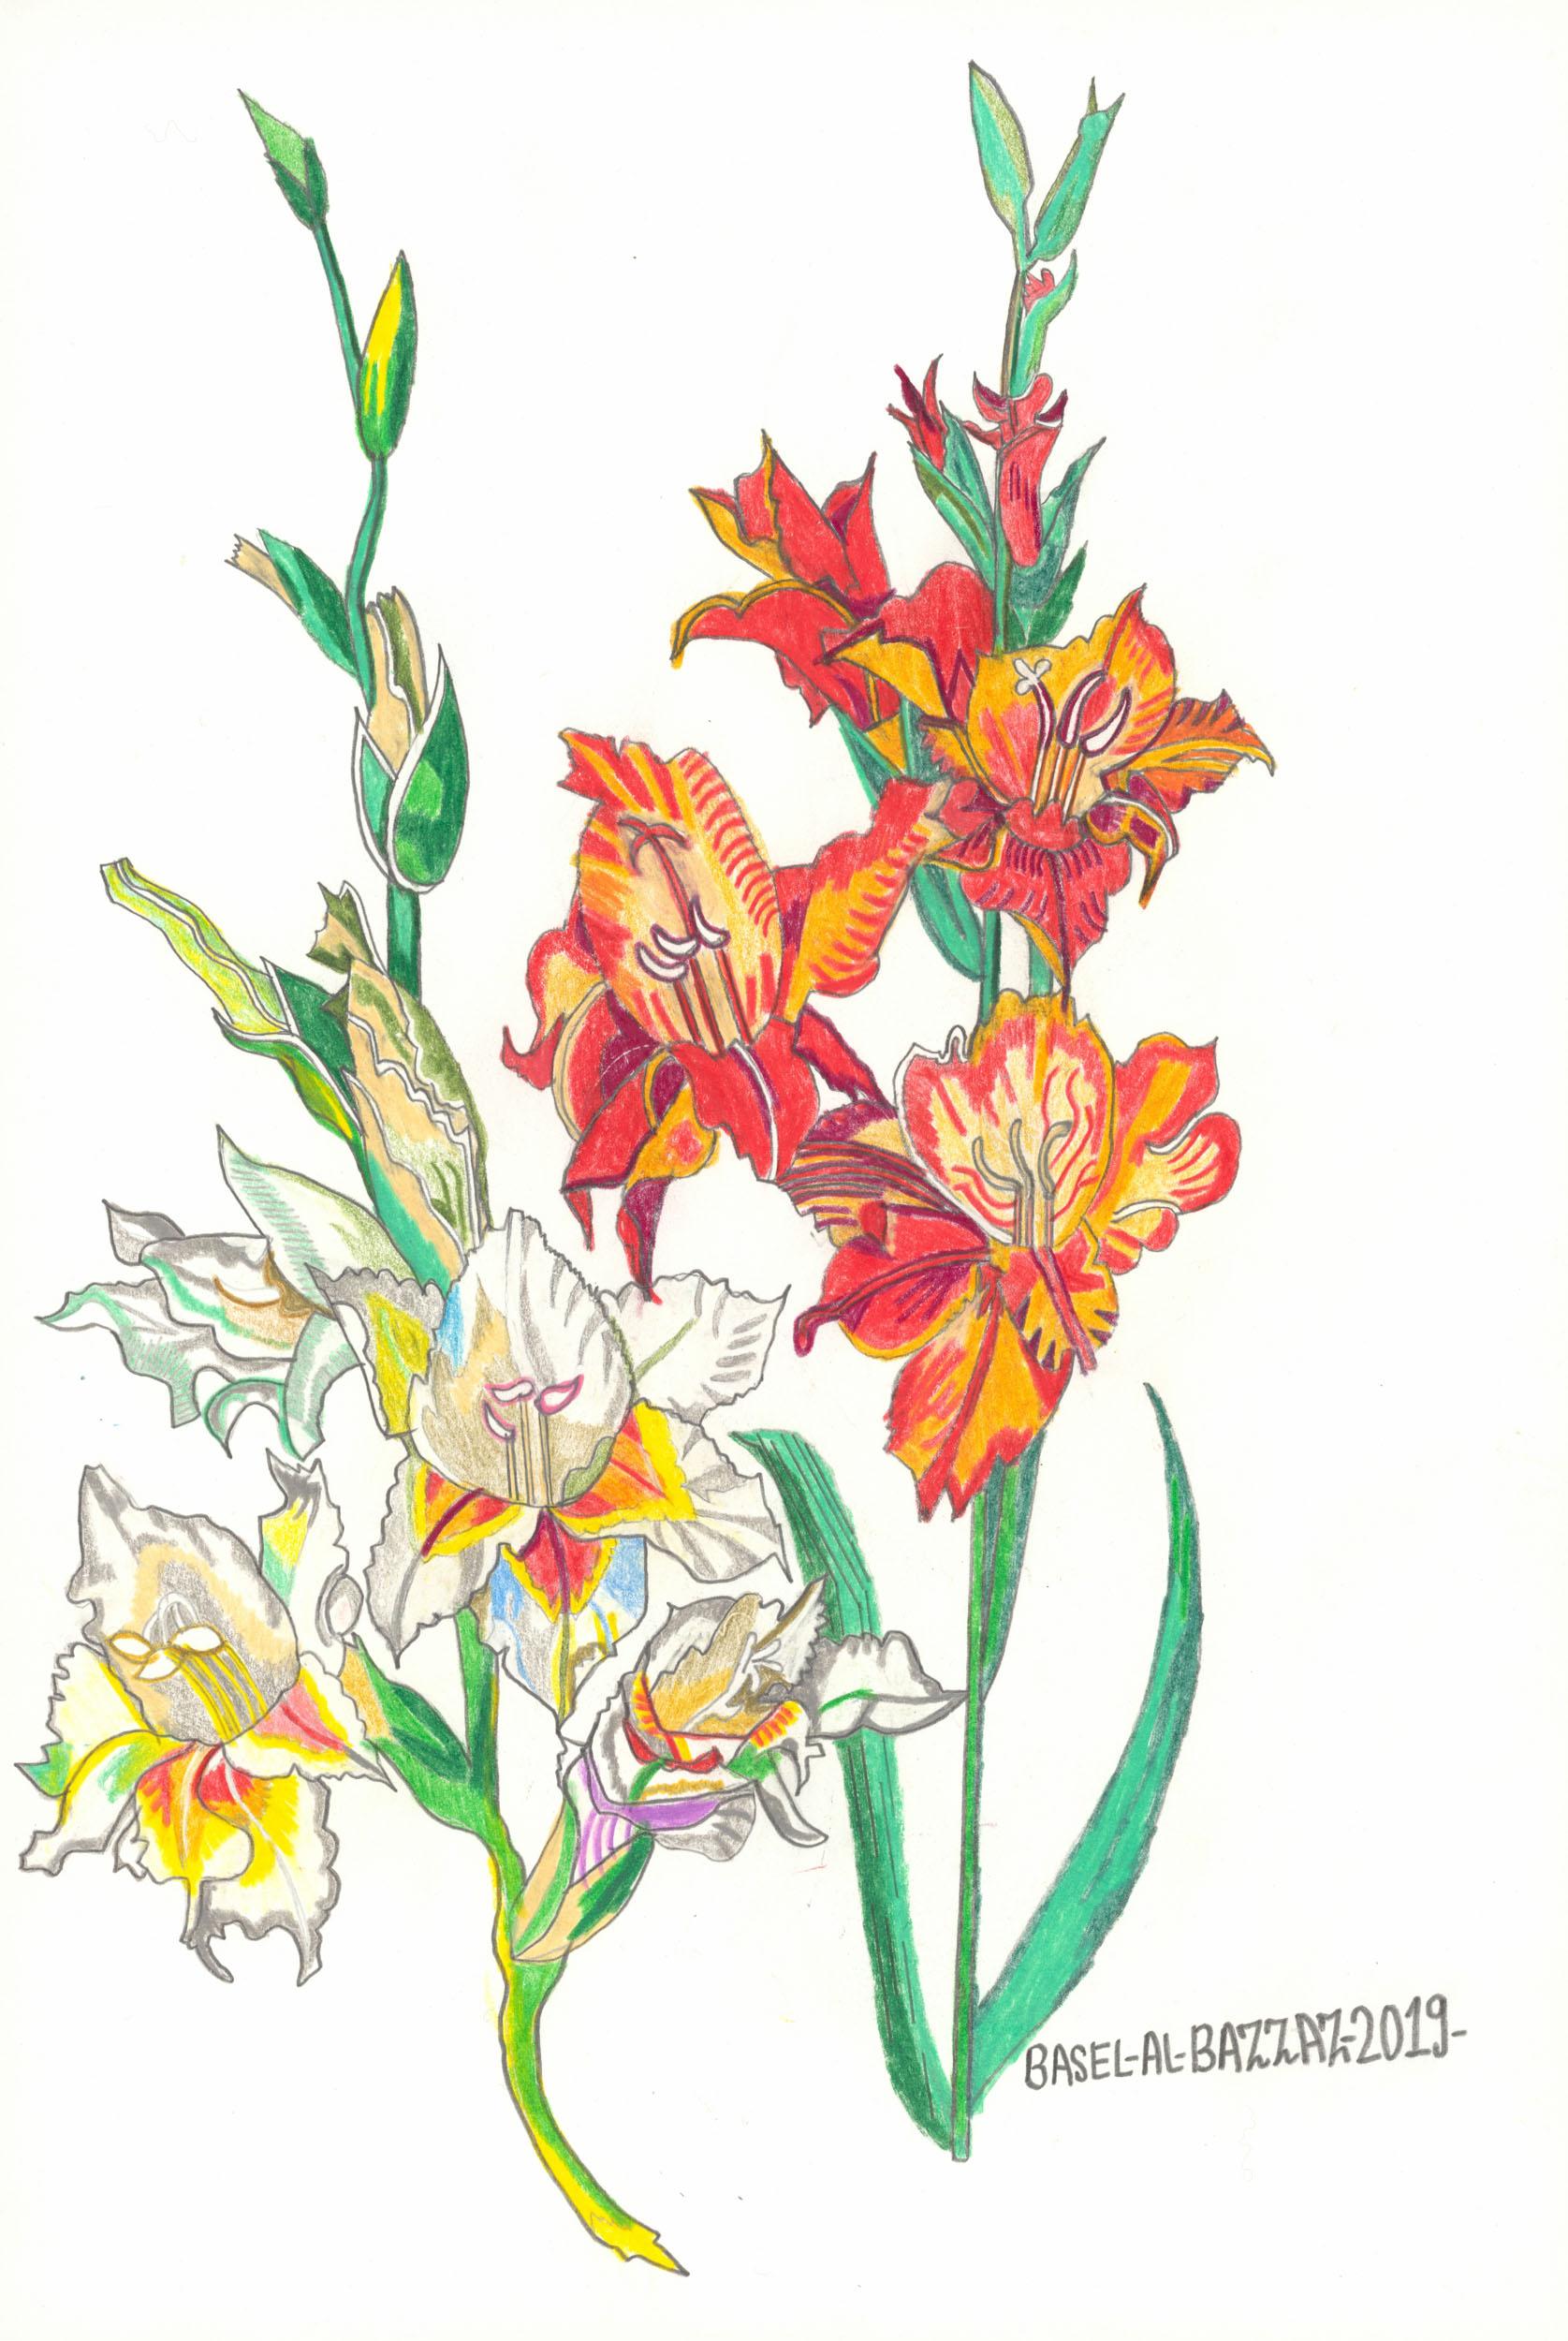 al-bazzaz basel - Iris